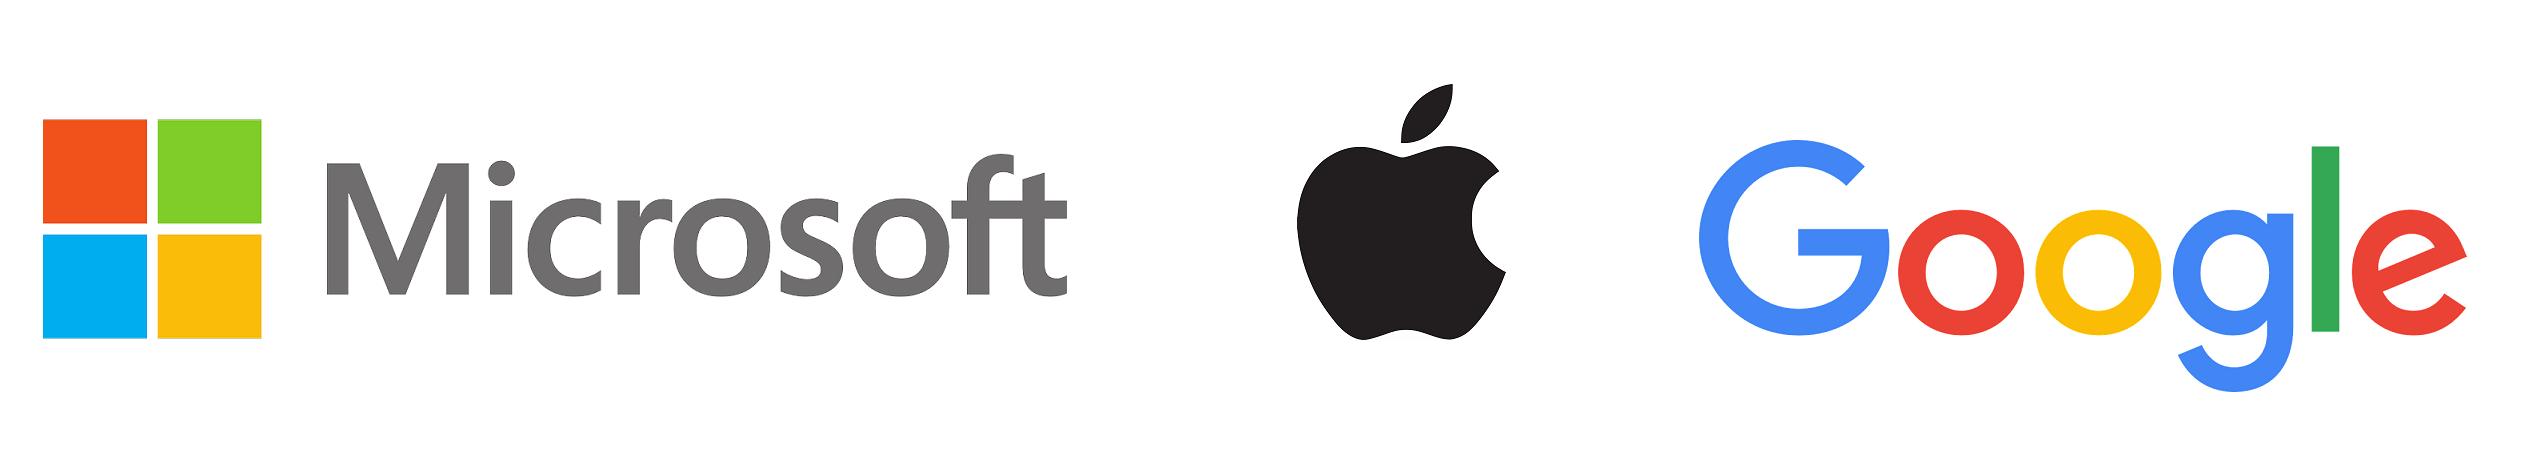 Microsoft, Apple, Google logos paint